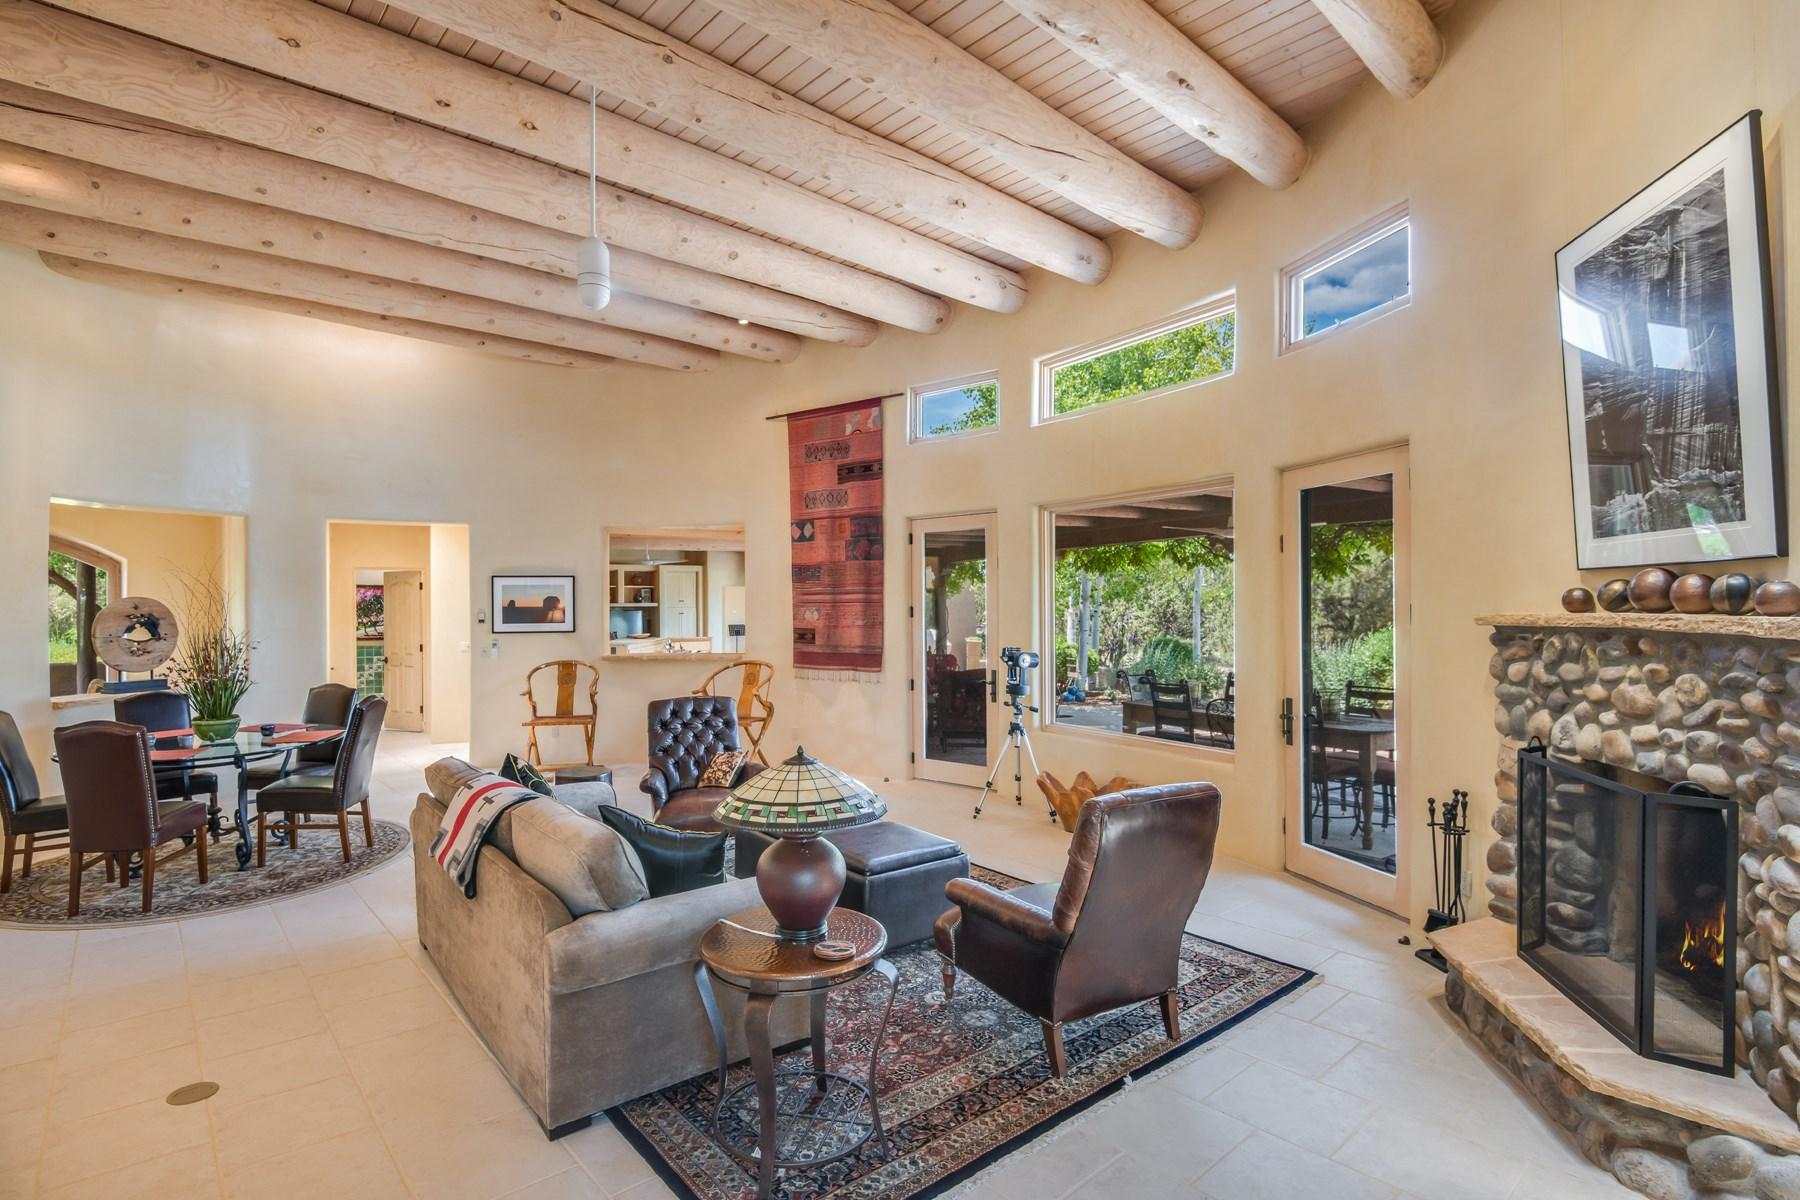 Single Family Home for Sale at 61 Thundercloud Las Campanas & Los Santeros, Santa Fe, New Mexico, 87506 United States